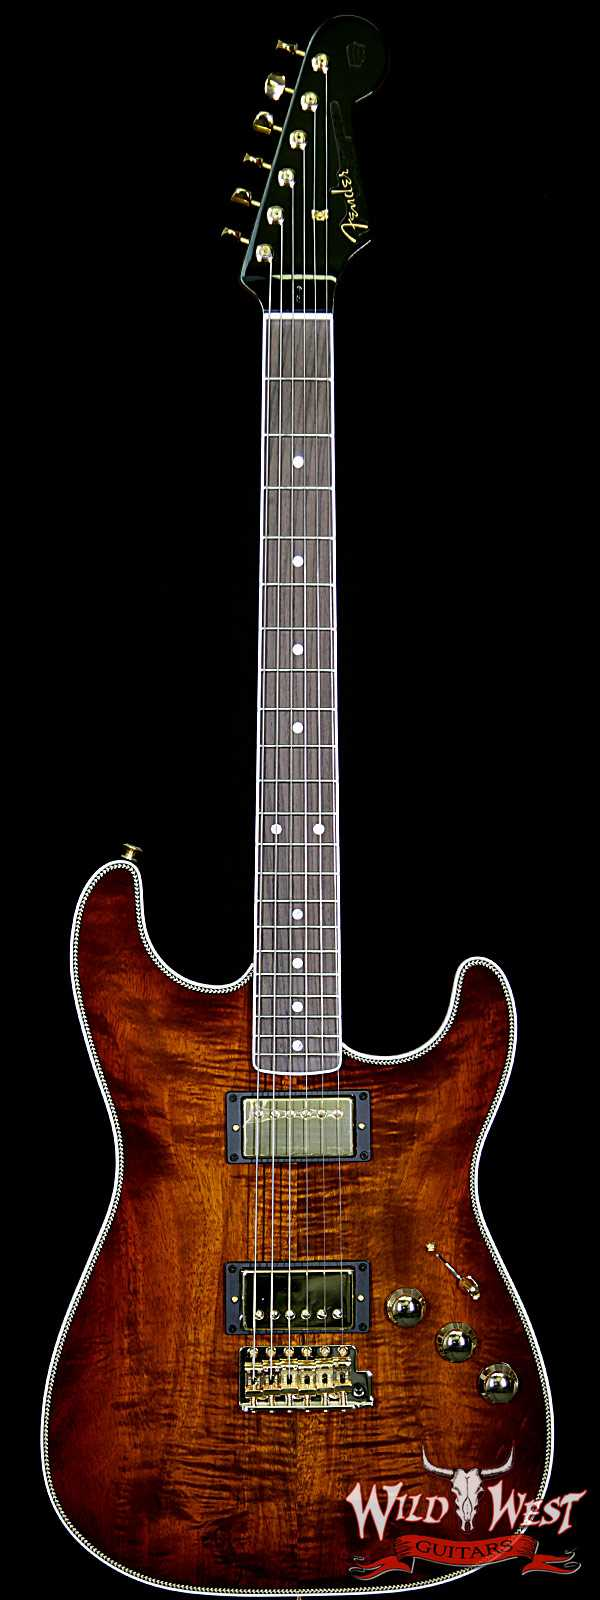 Fender Custom Shop 2018 NAMM #2005 Apprentice Built Roasted Ash Stratocaster NOS Koa Top Flame Maple Neck by Carlos Lopez